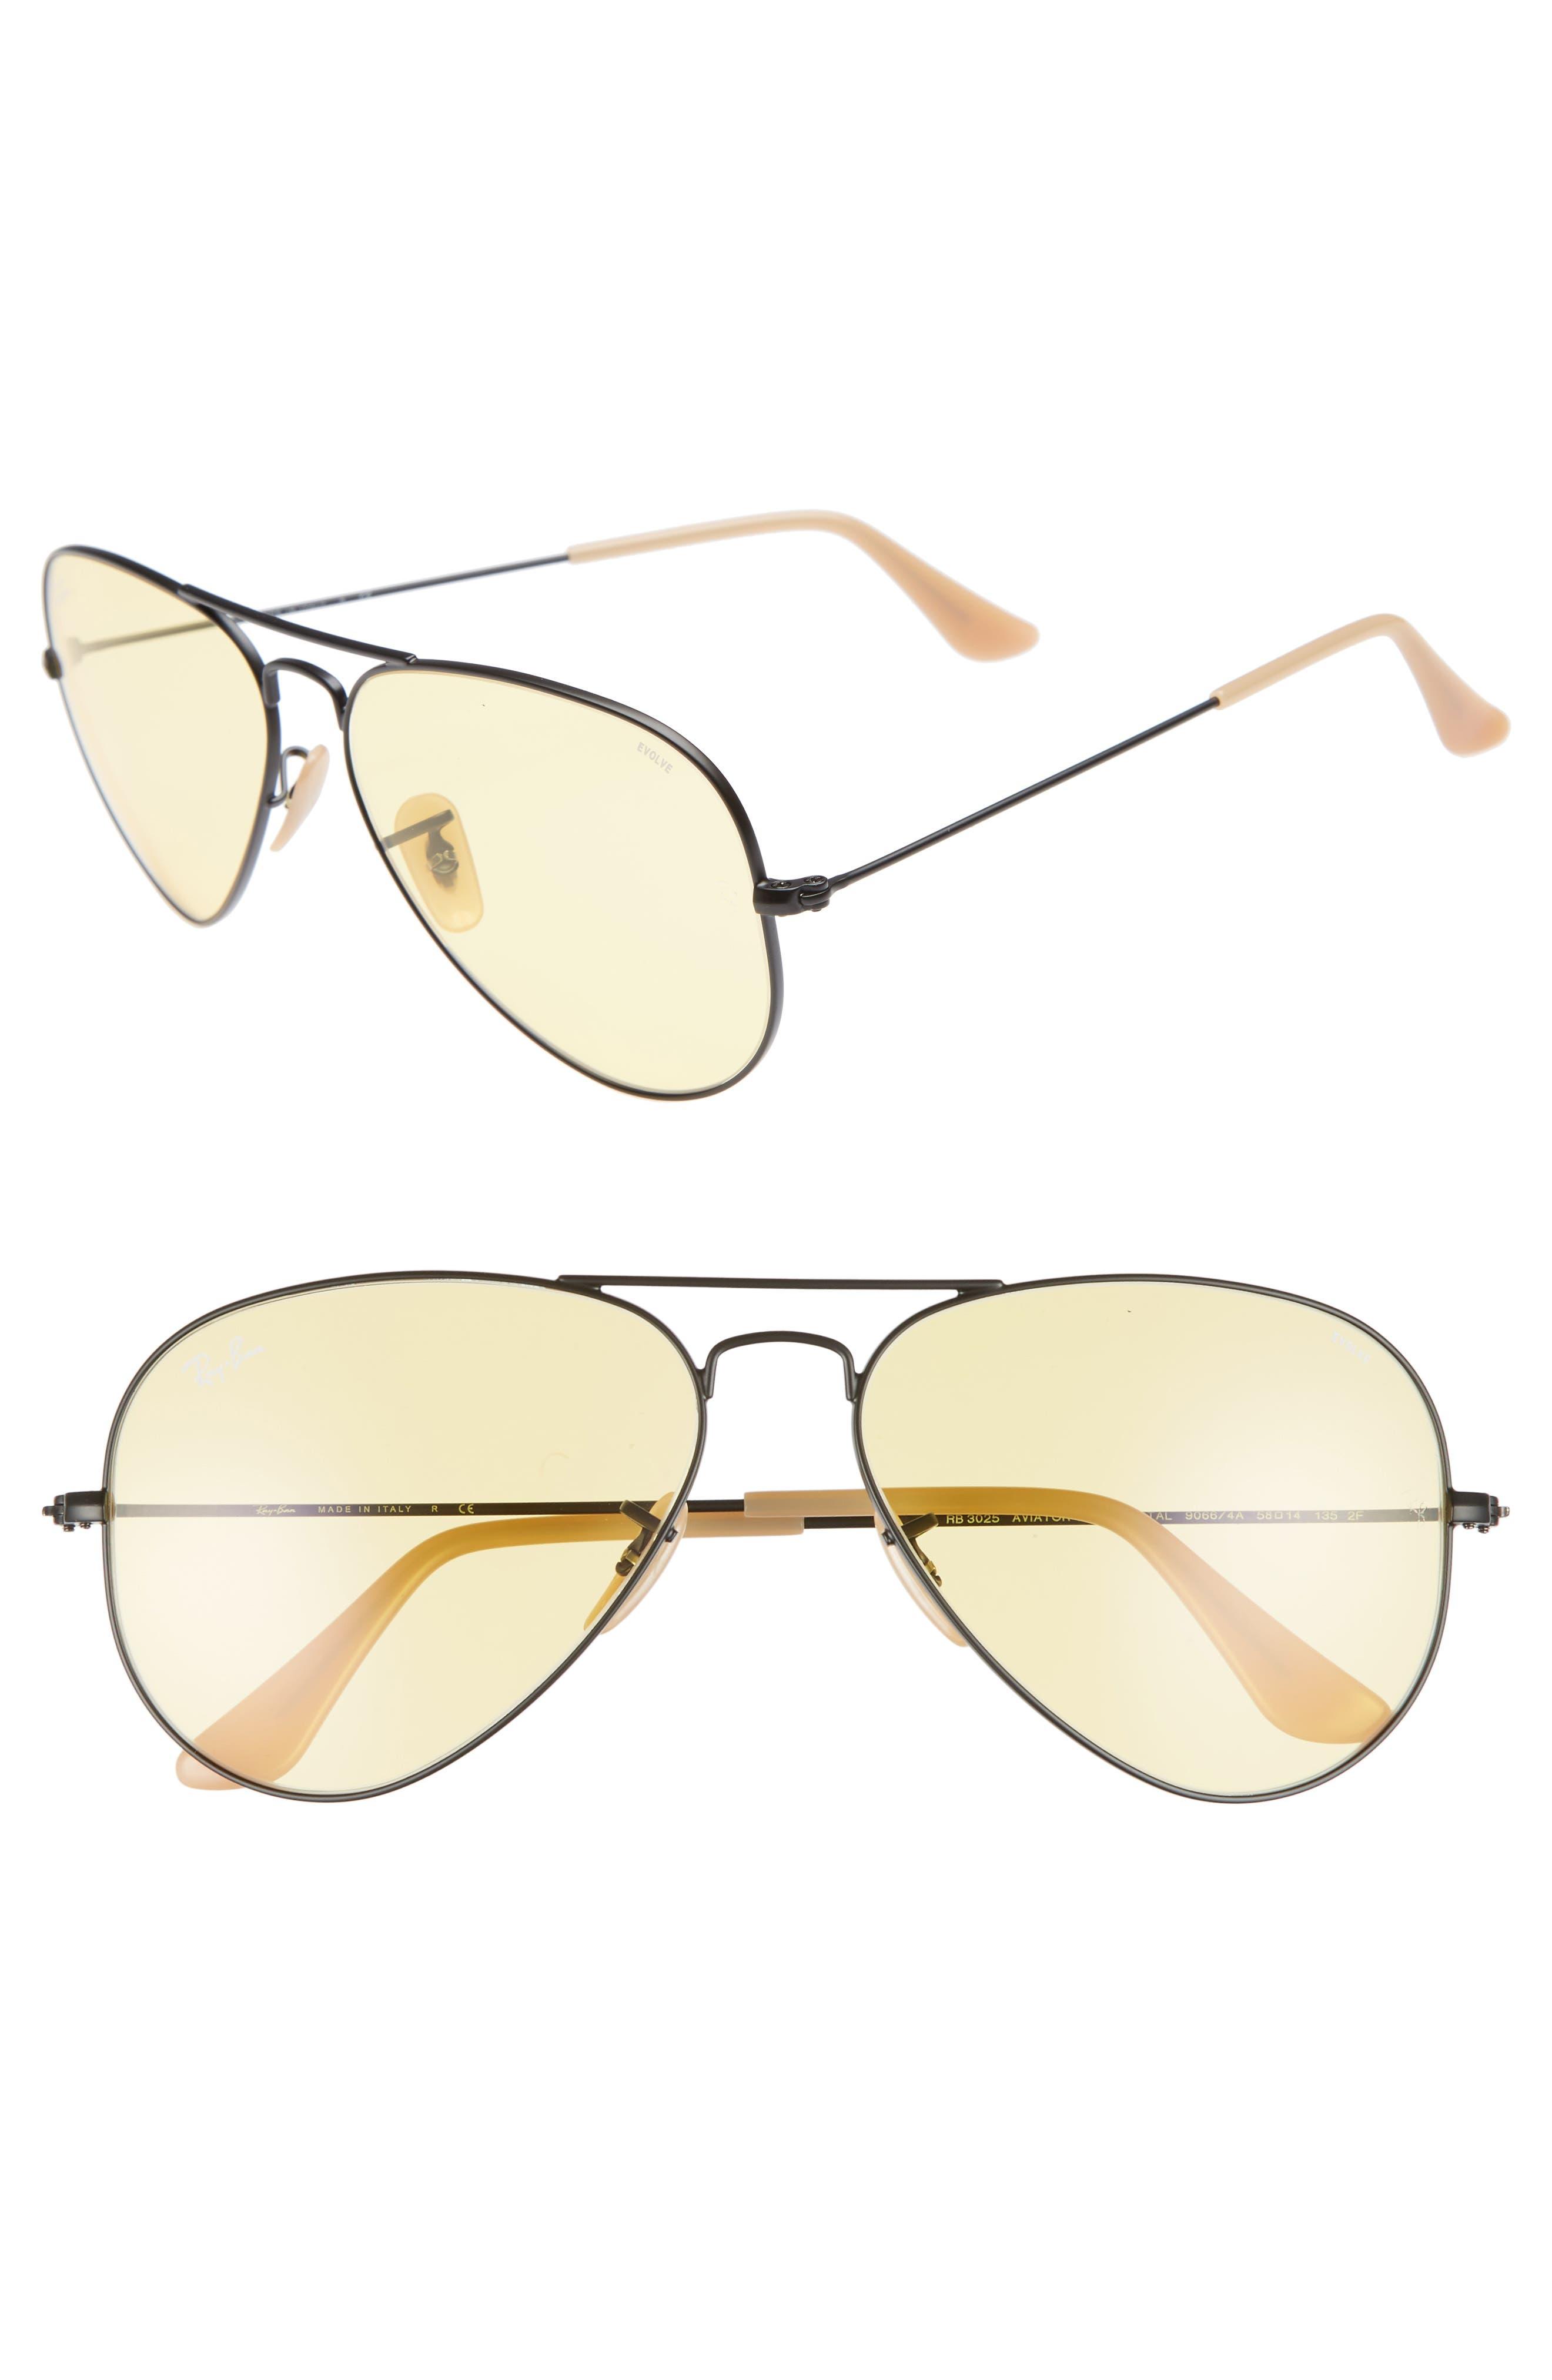 Alternate Image 1 Selected - Ray-Ban Evolve 58mm Polarized Aviator Sunglasses